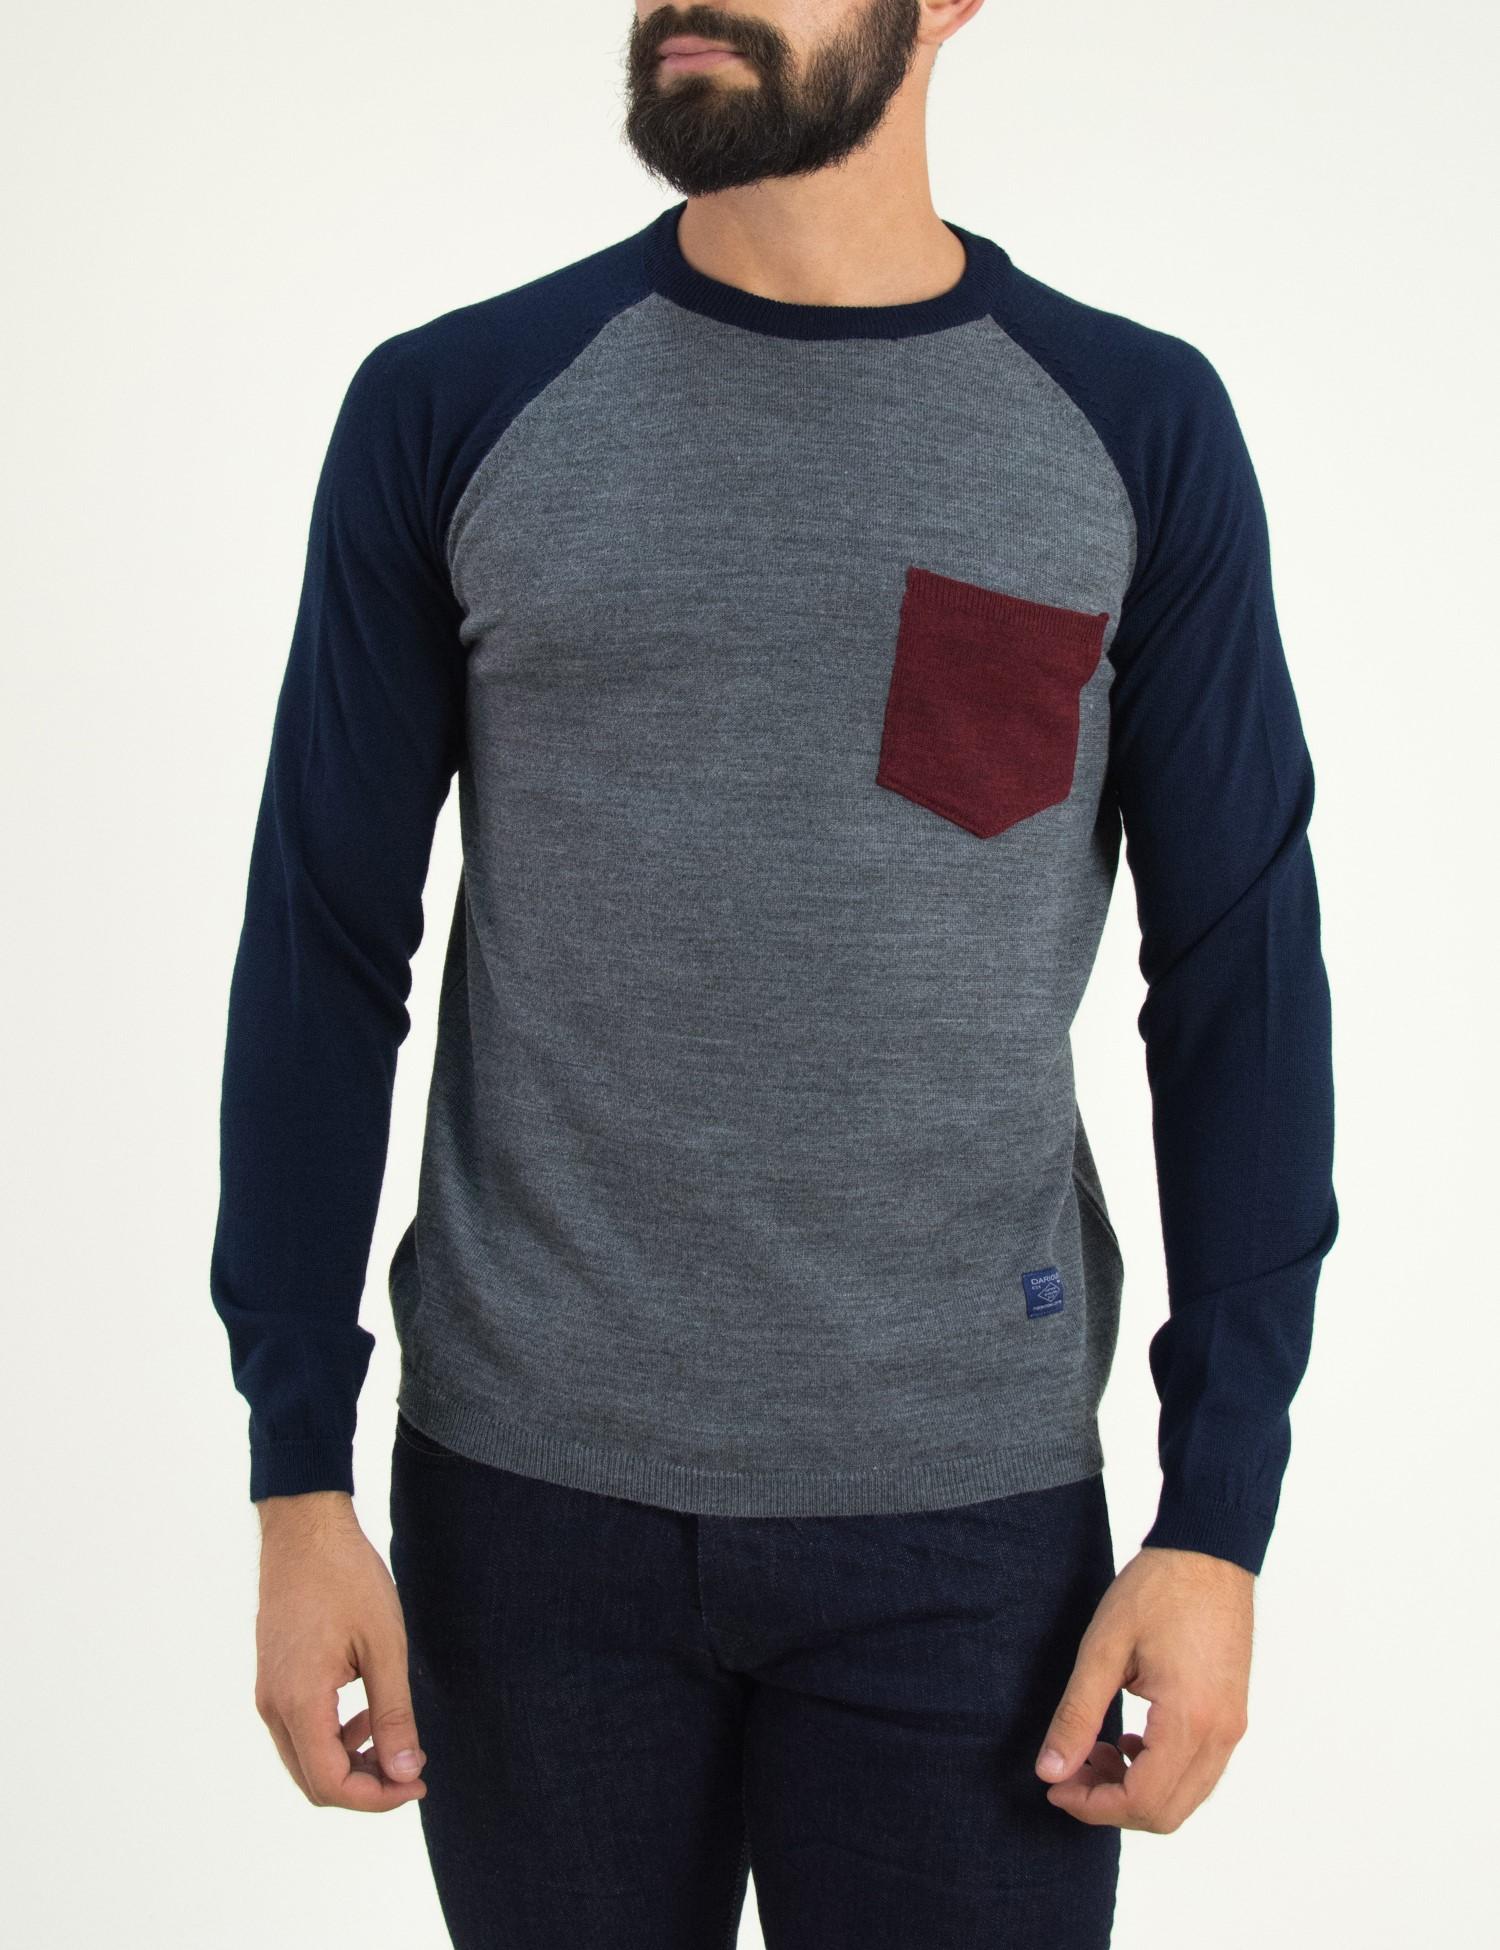 fb7c68321fe0 Darious γκρι μακρυμάνικη μπλούζα 1677